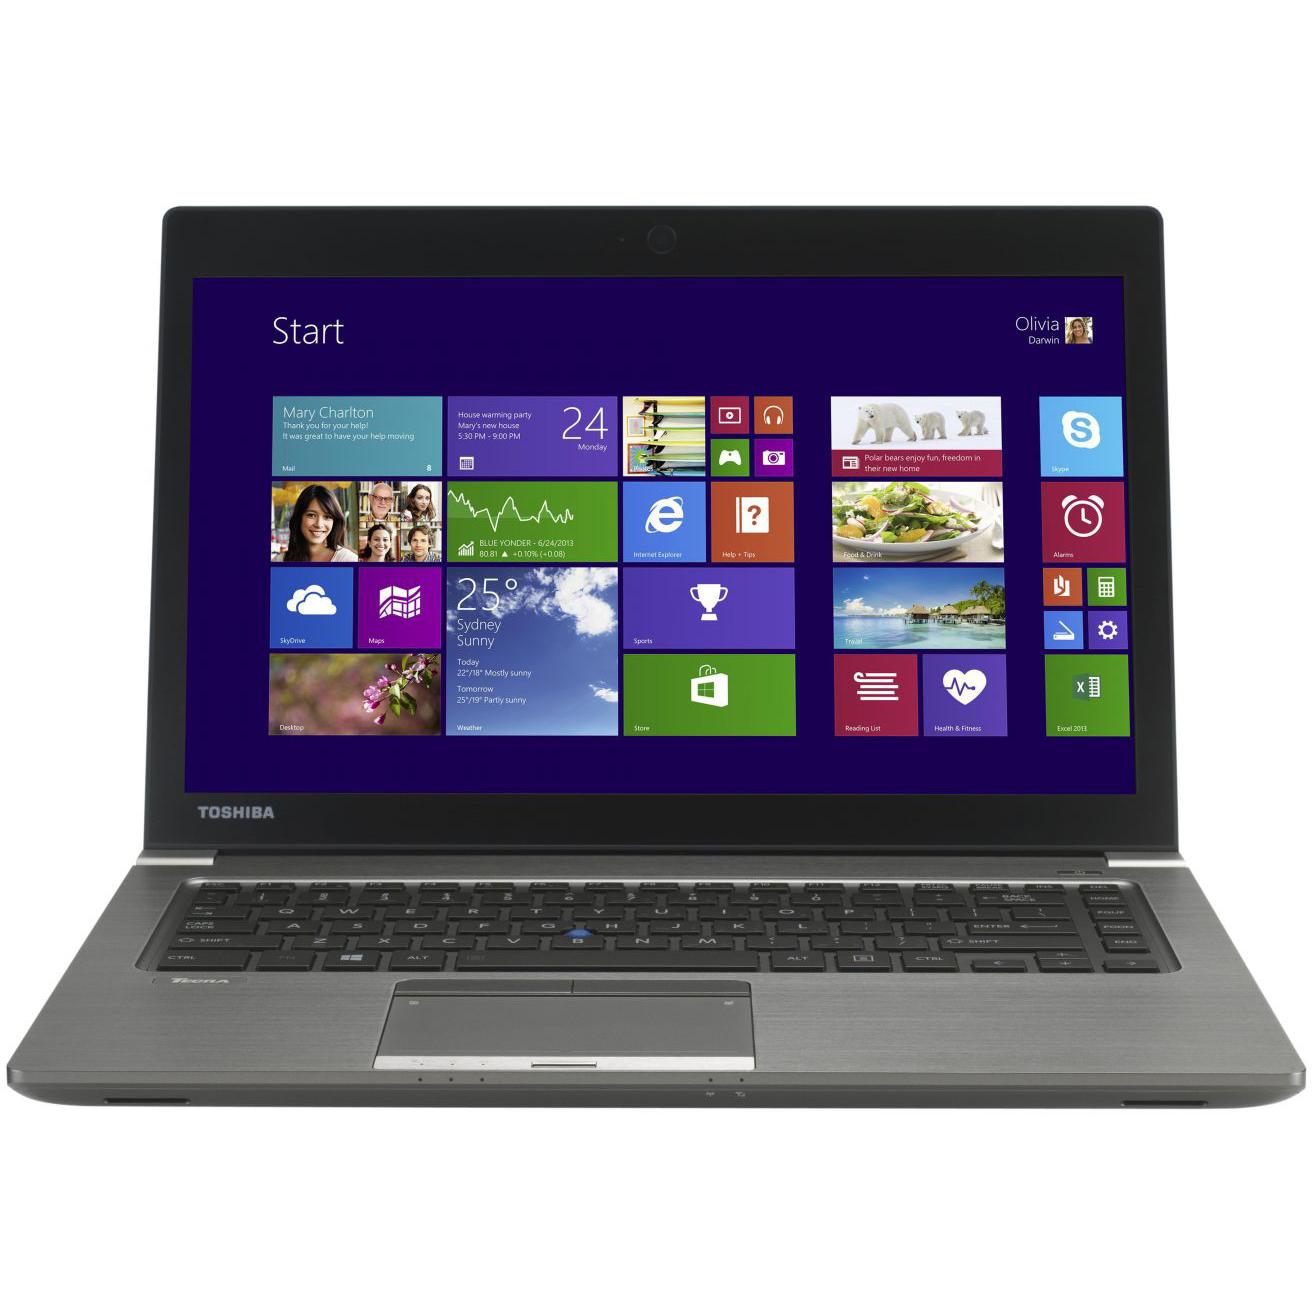 Toshiba Tecra Z40 A 14 Laptop Intel I7 4600U Dual Core 2